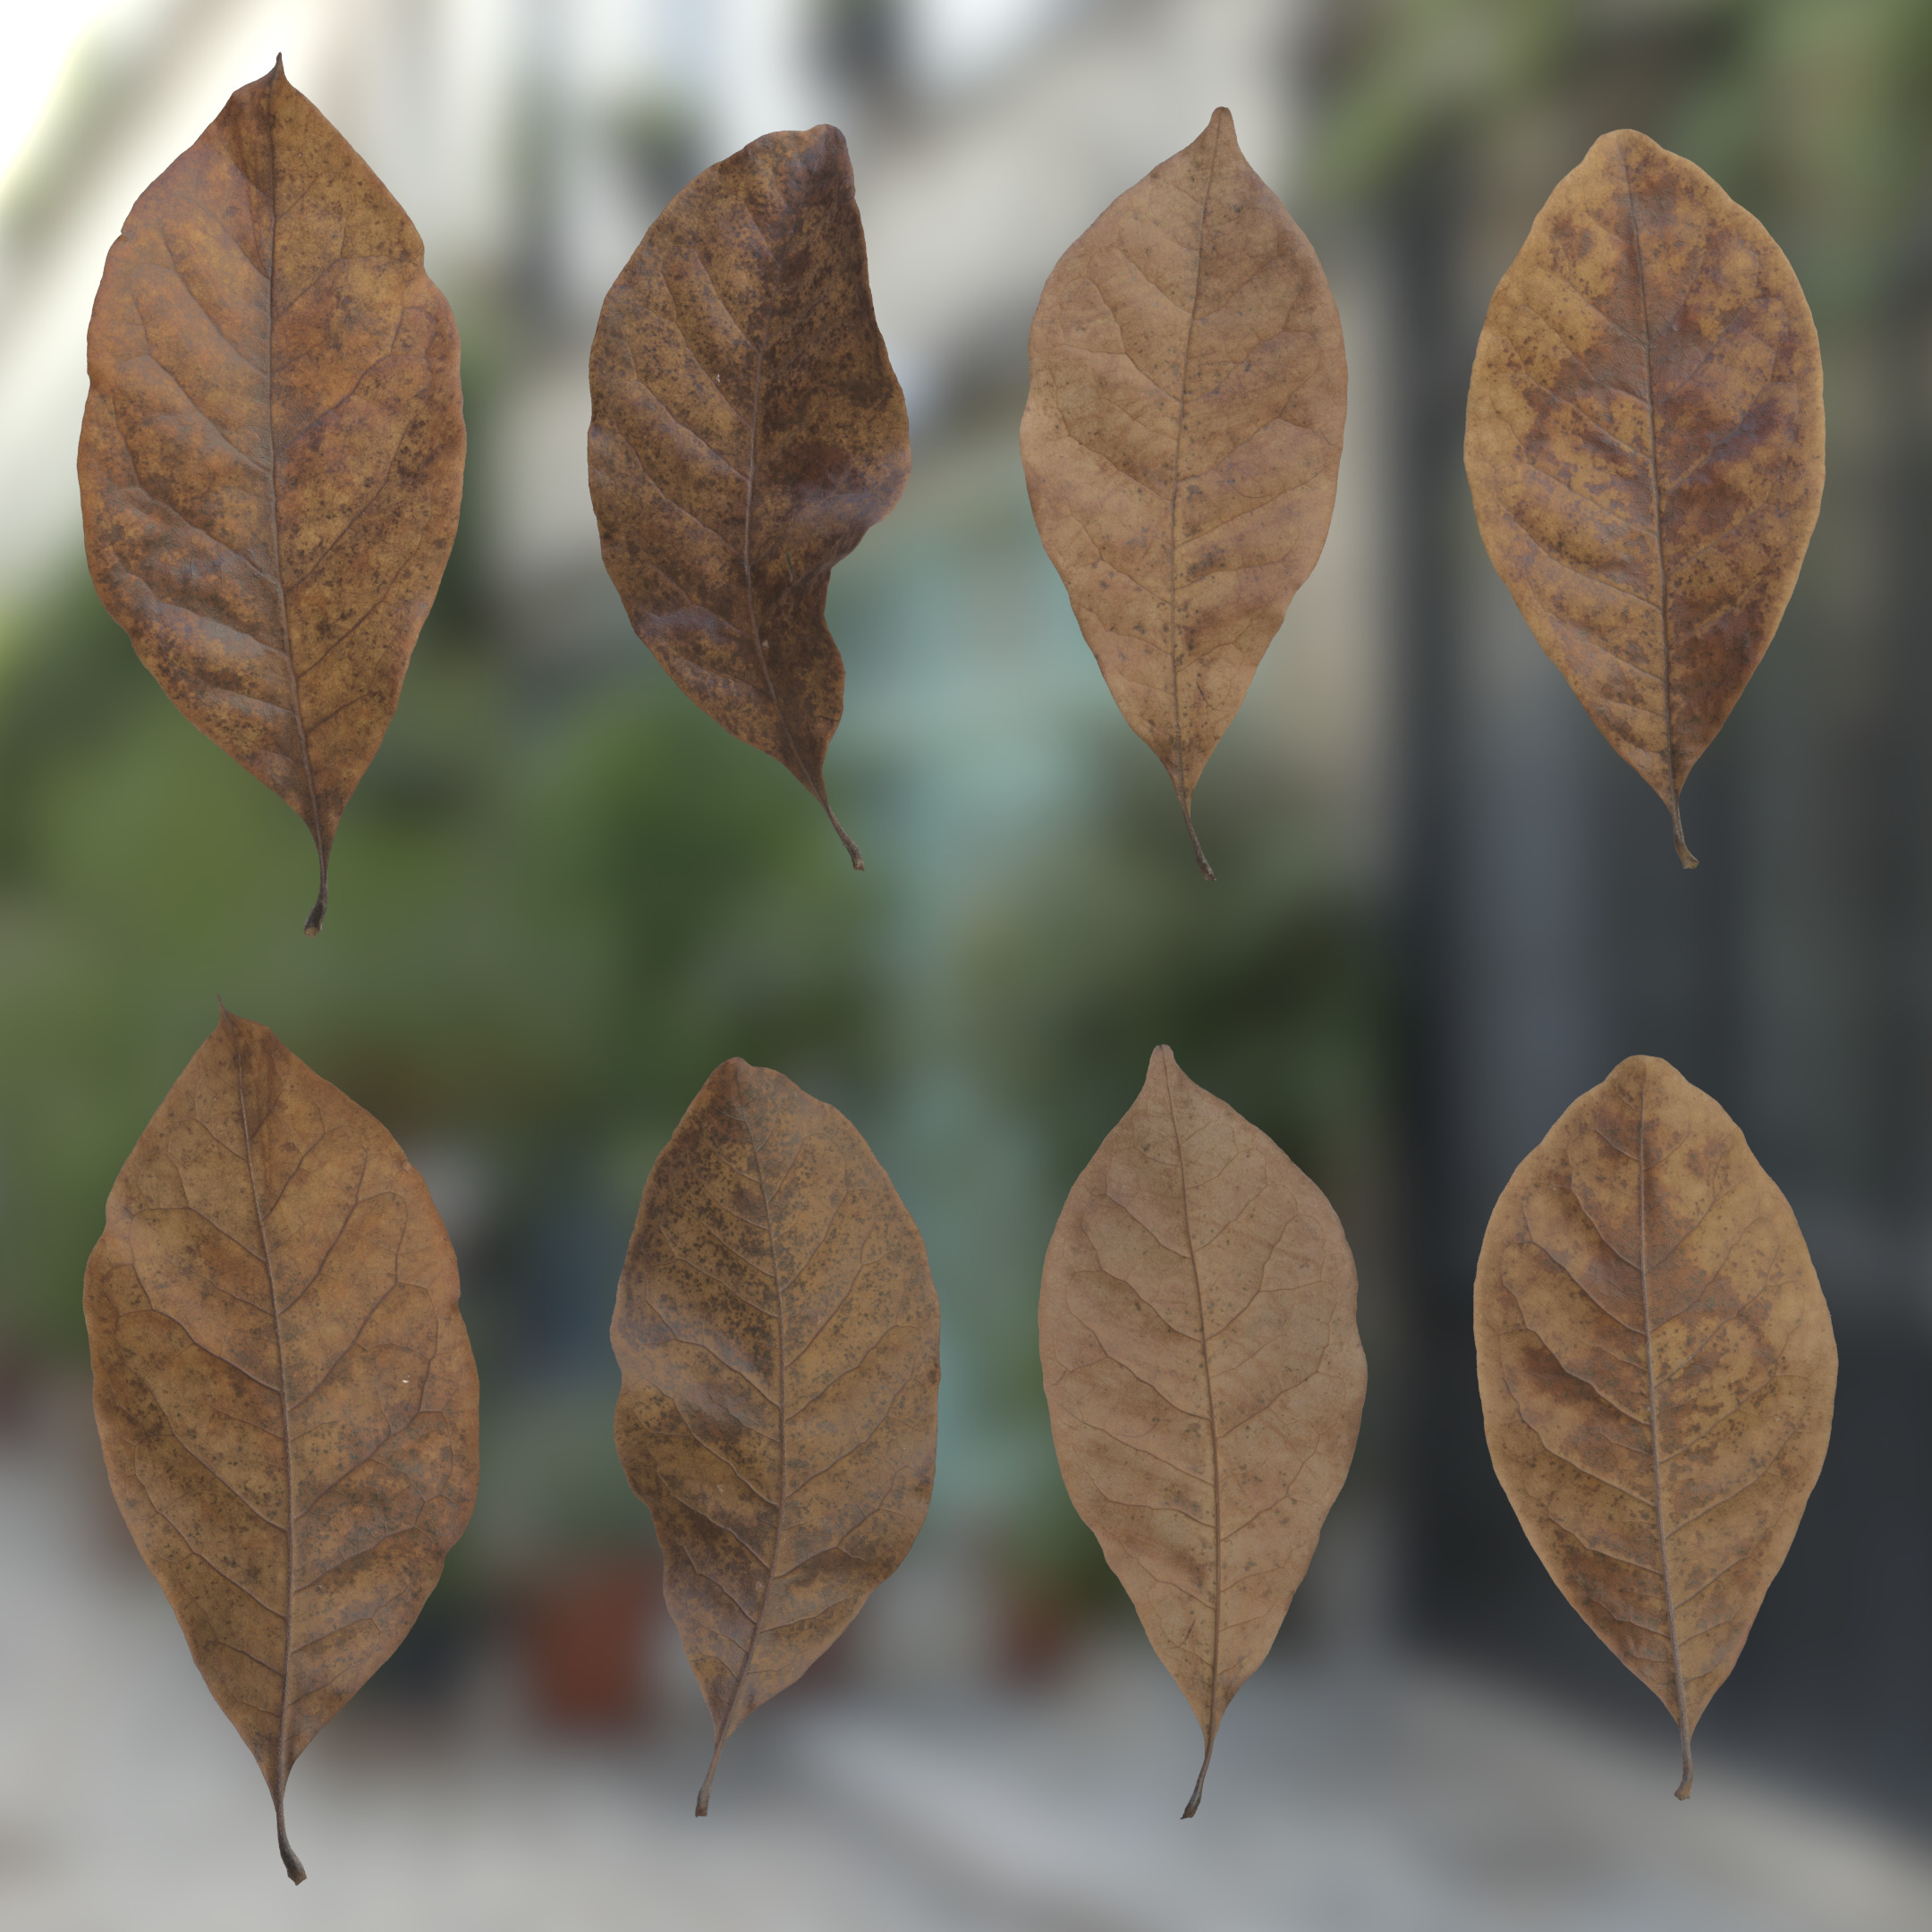 3d Scanned Dead Magnolia Tree Leaves Atlas 01c